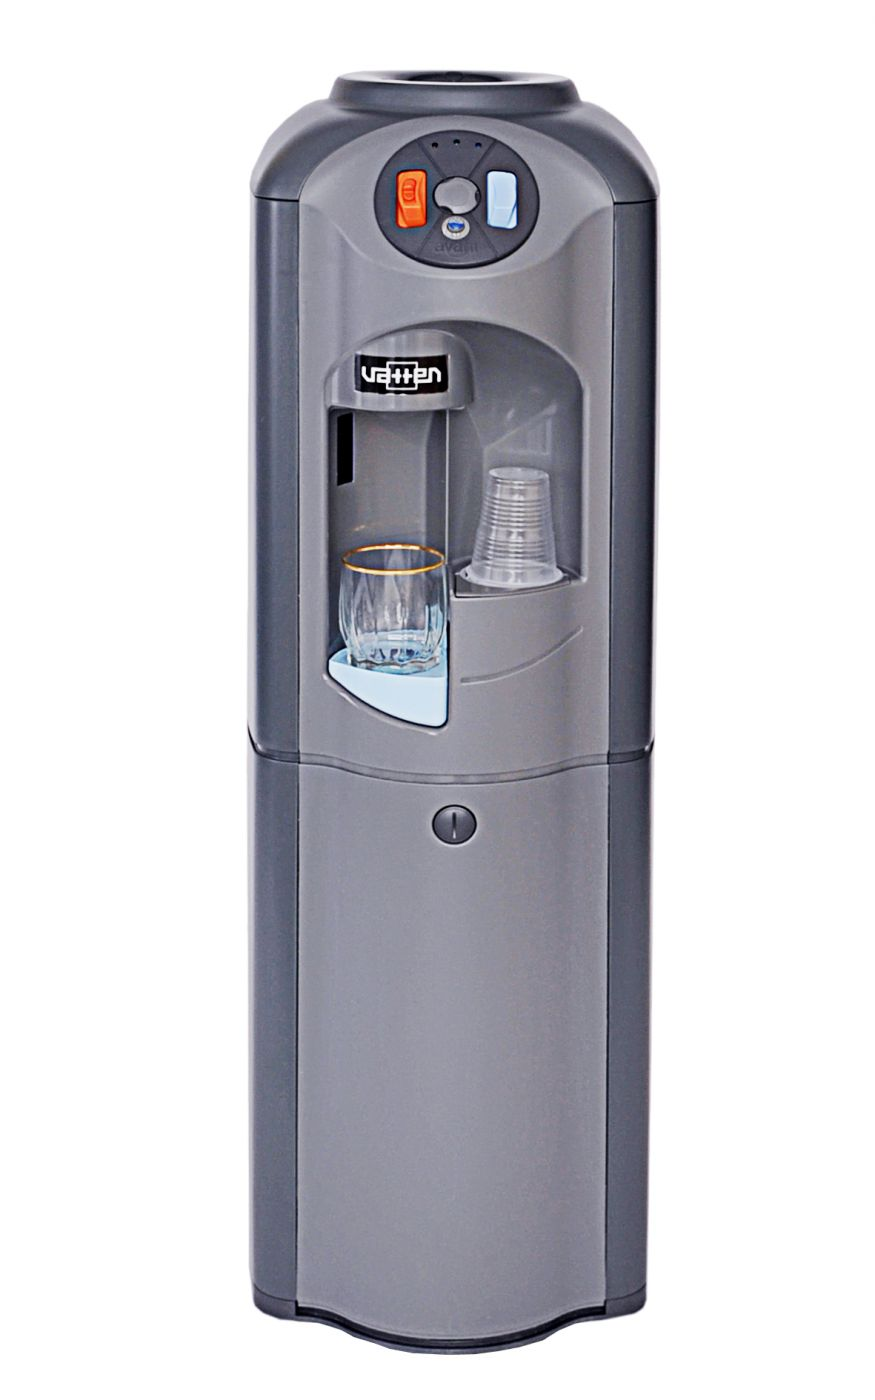 Кулер для воды VATTEN V401JKDG